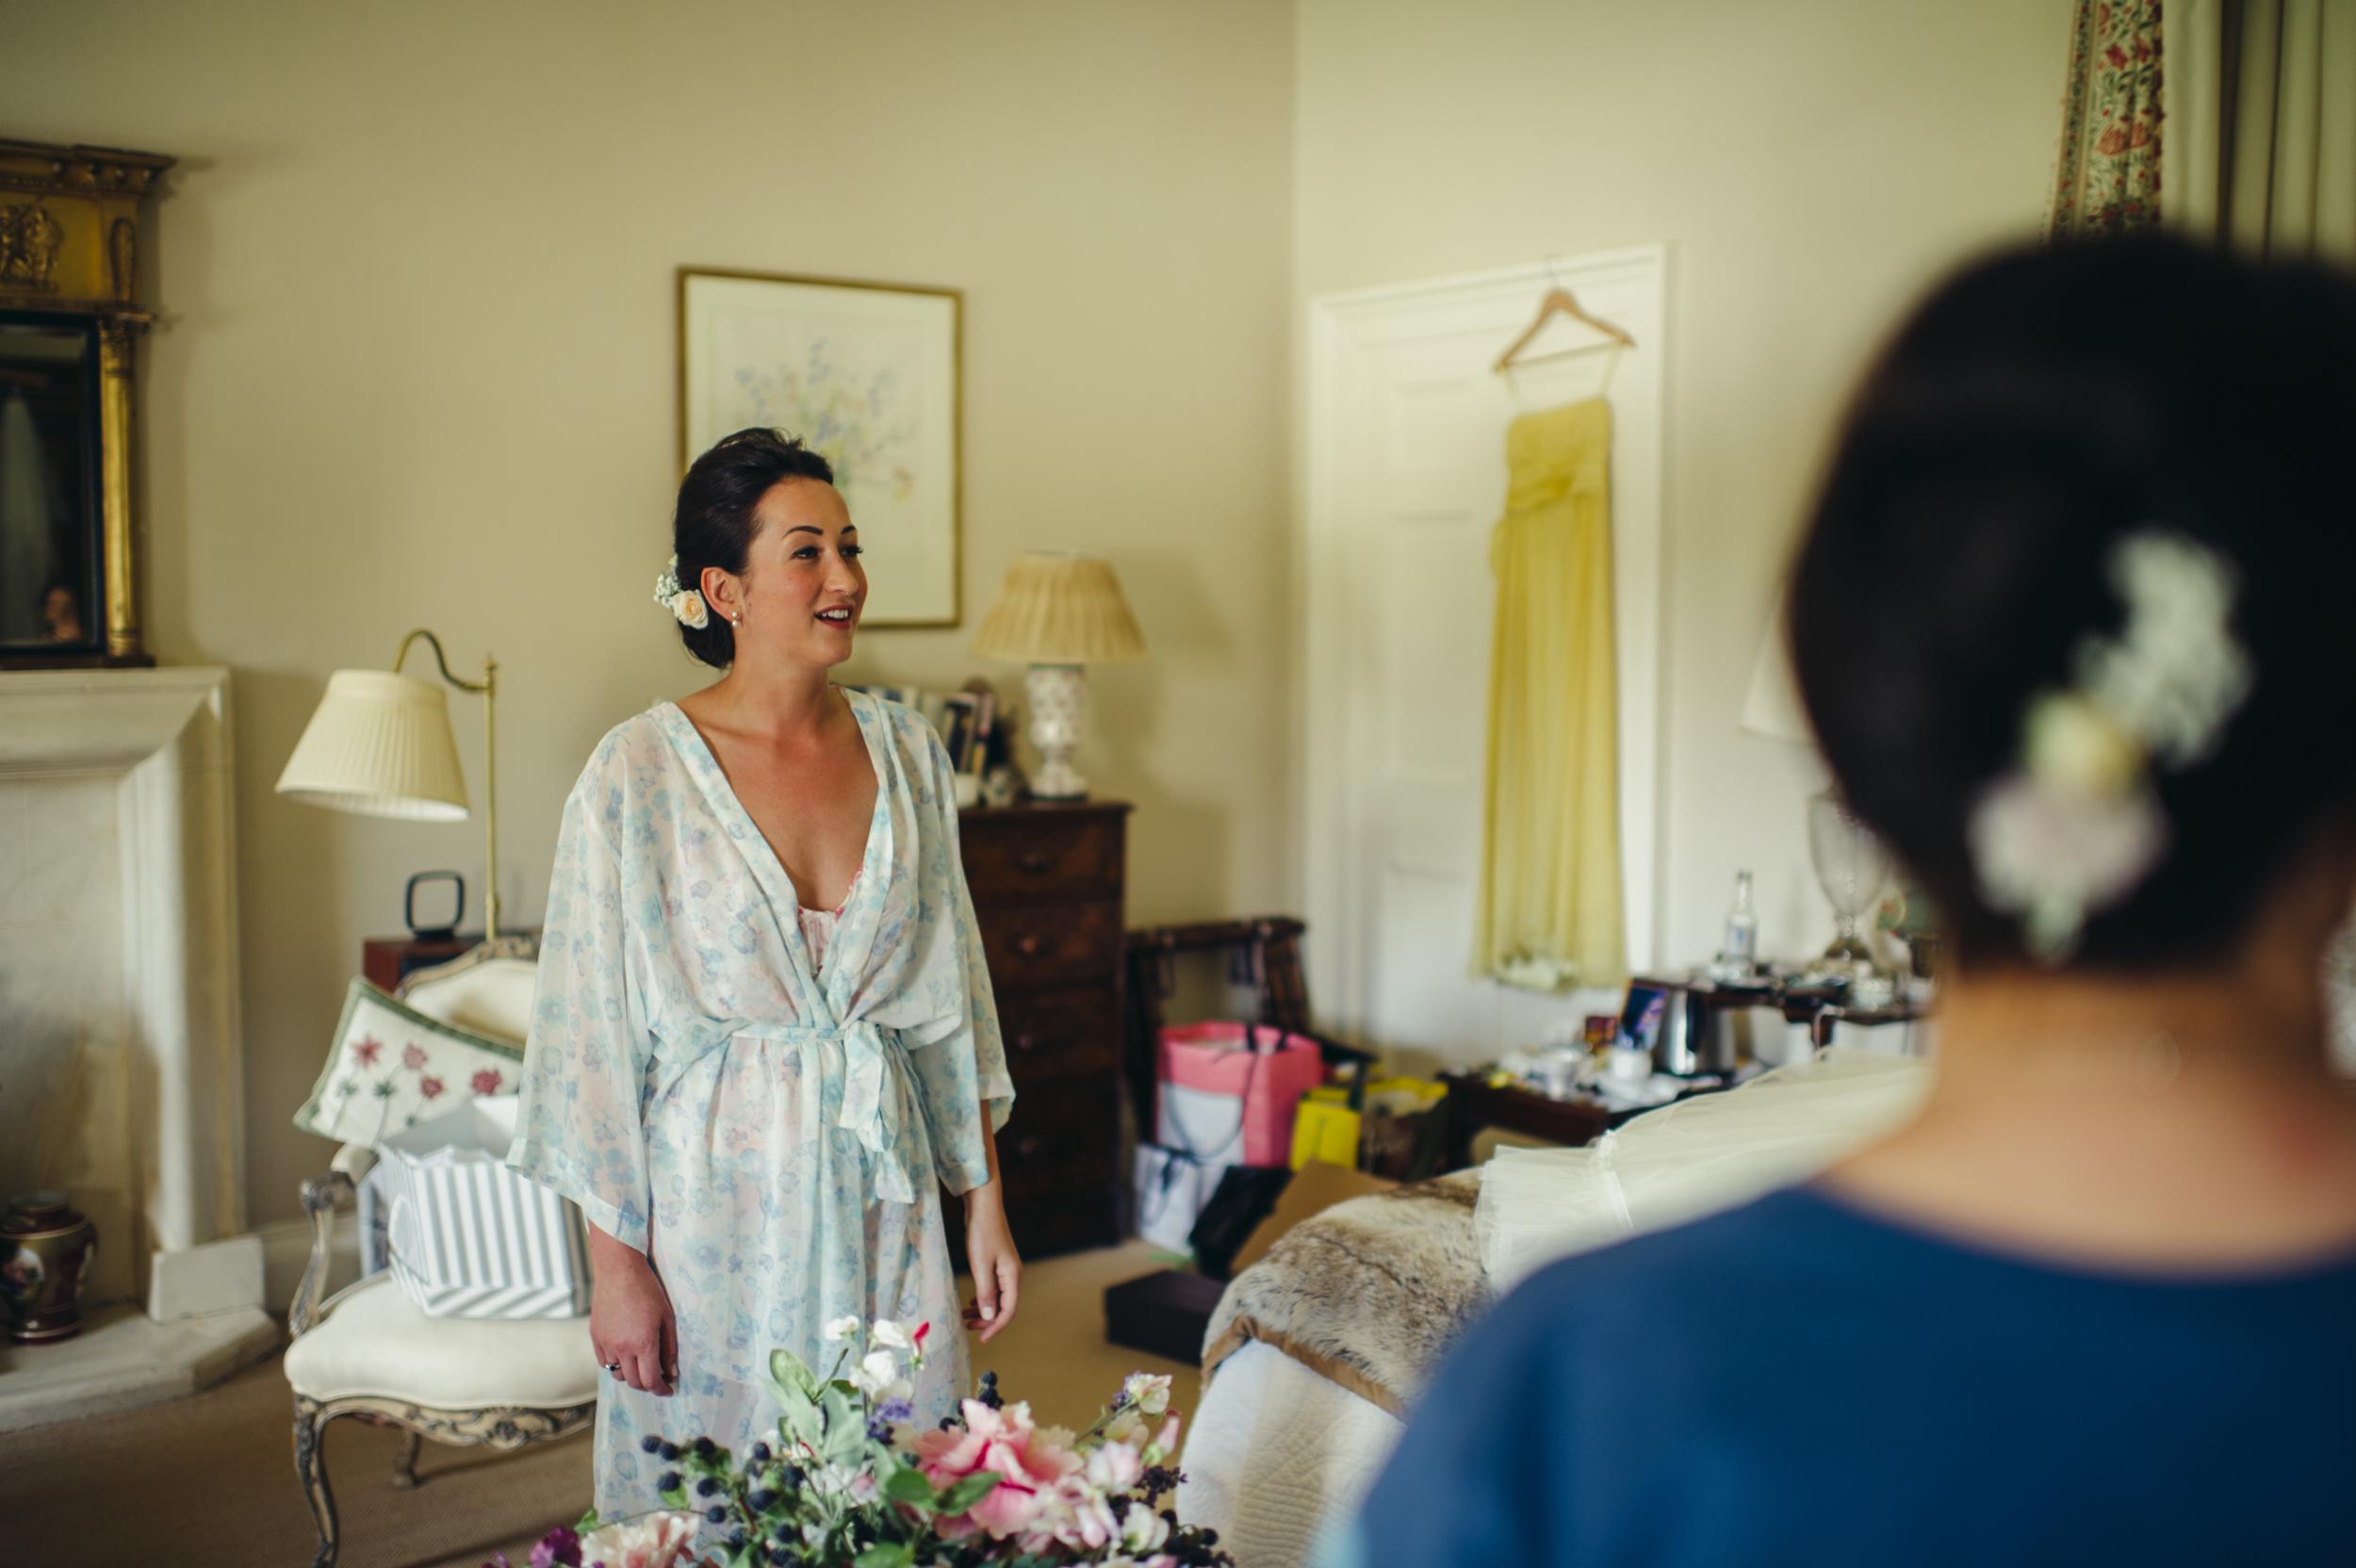 0041-lisa-devine-alternative-creative-wedding-photography-glasgow-edinburgh.JPG